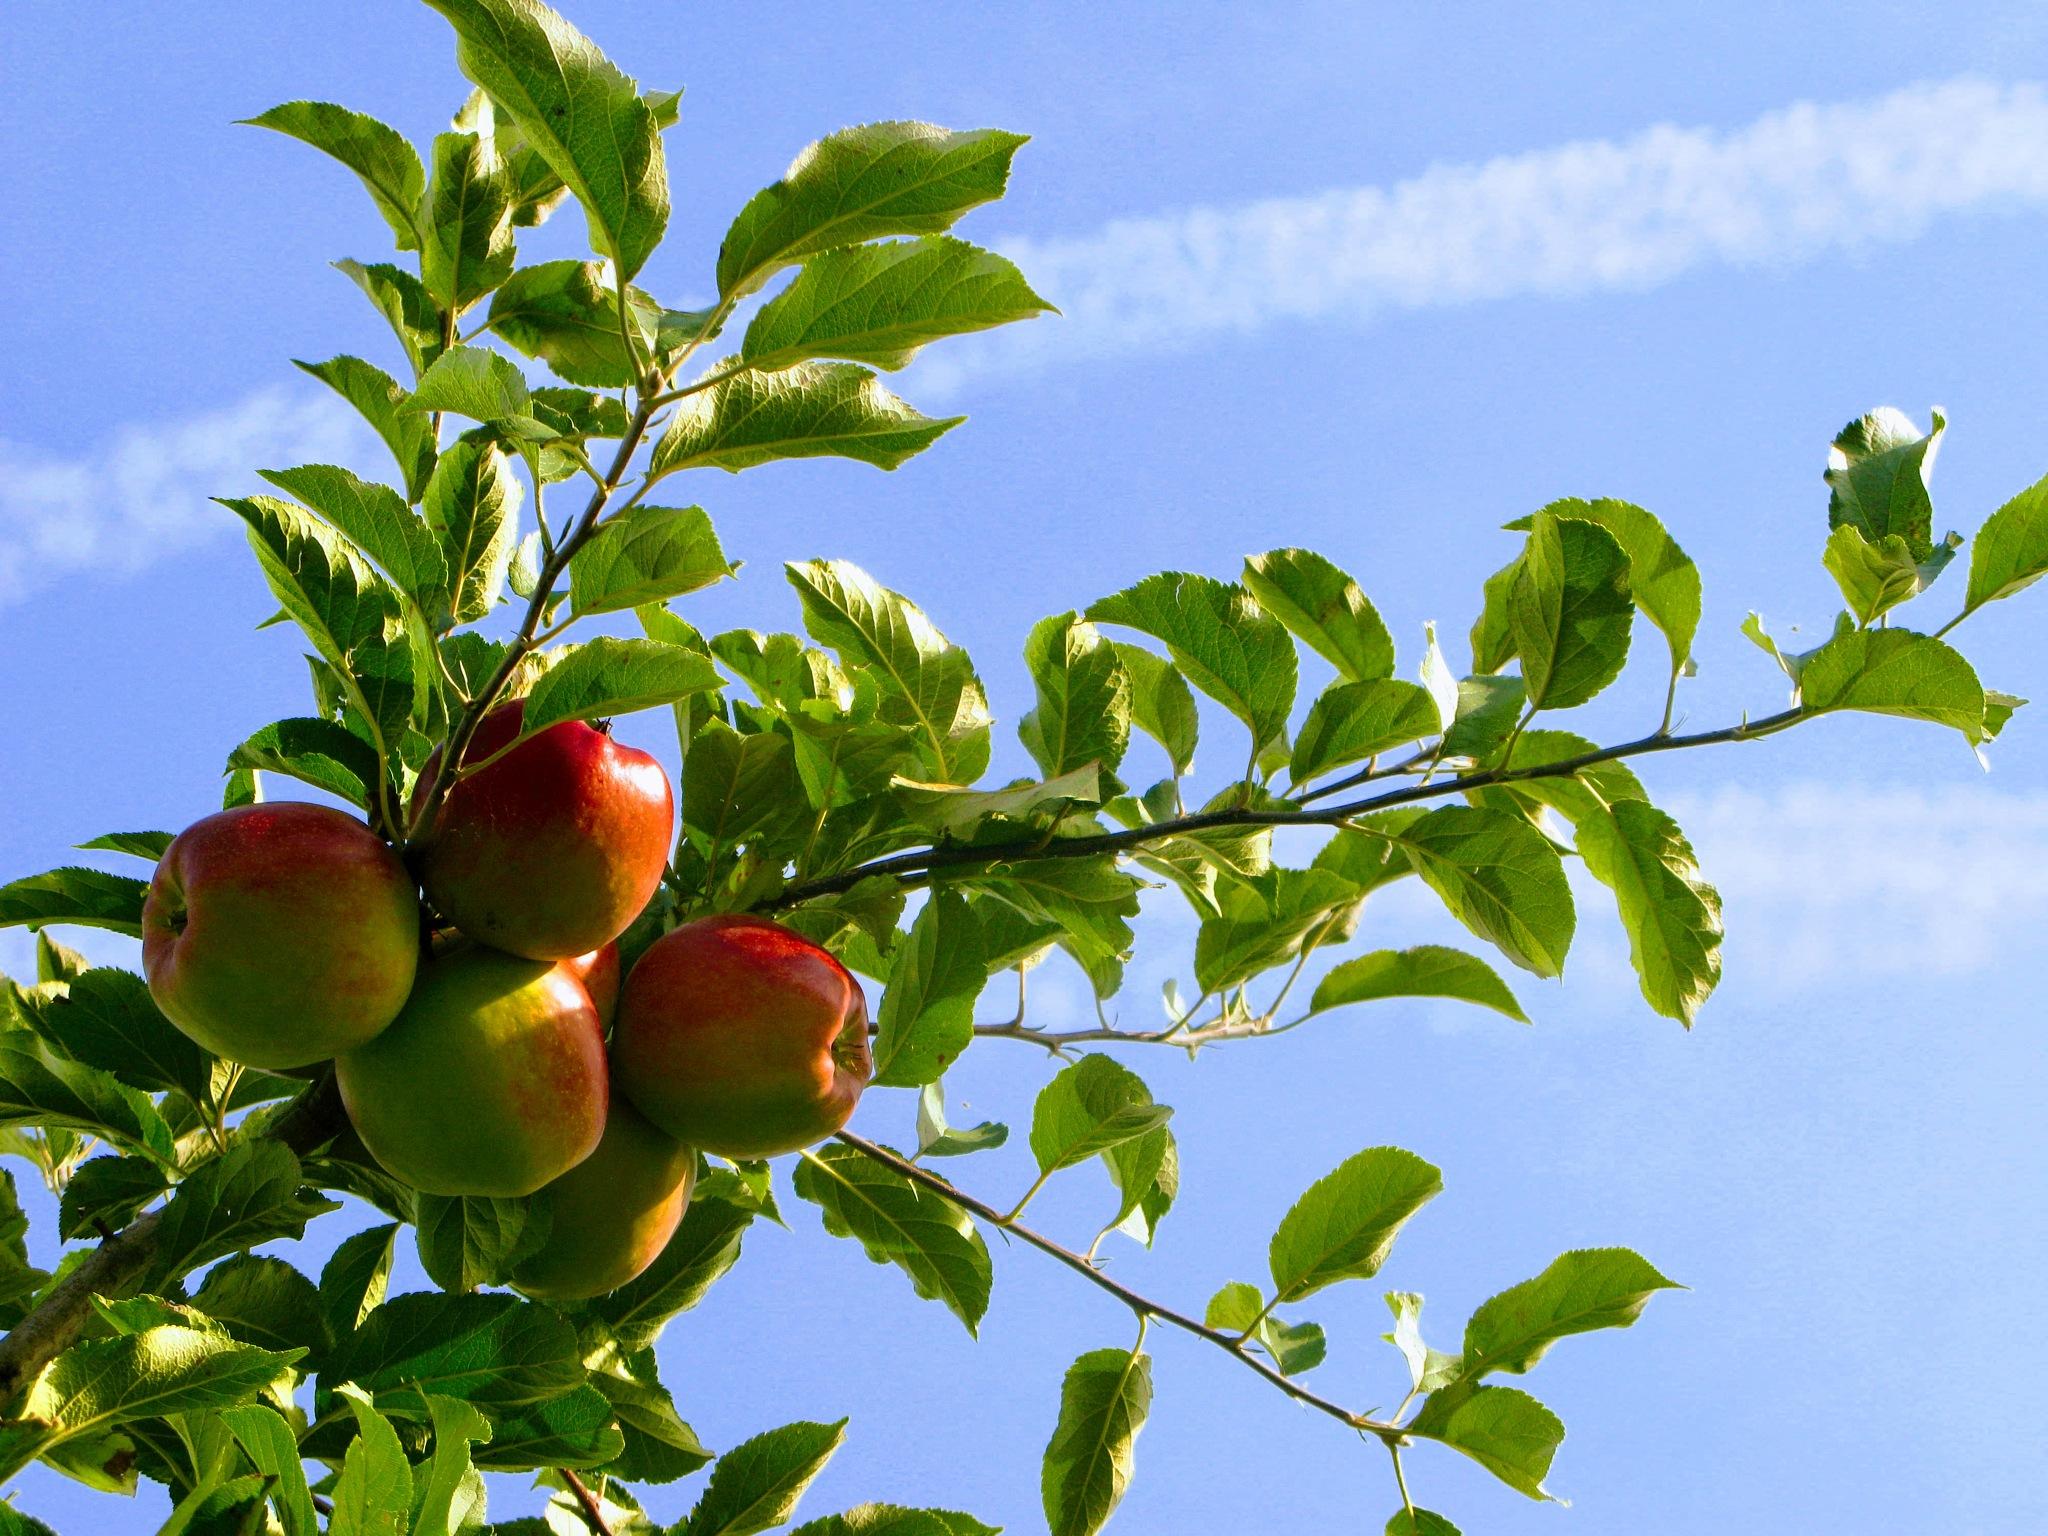 In the orchard by Ela Gajowska